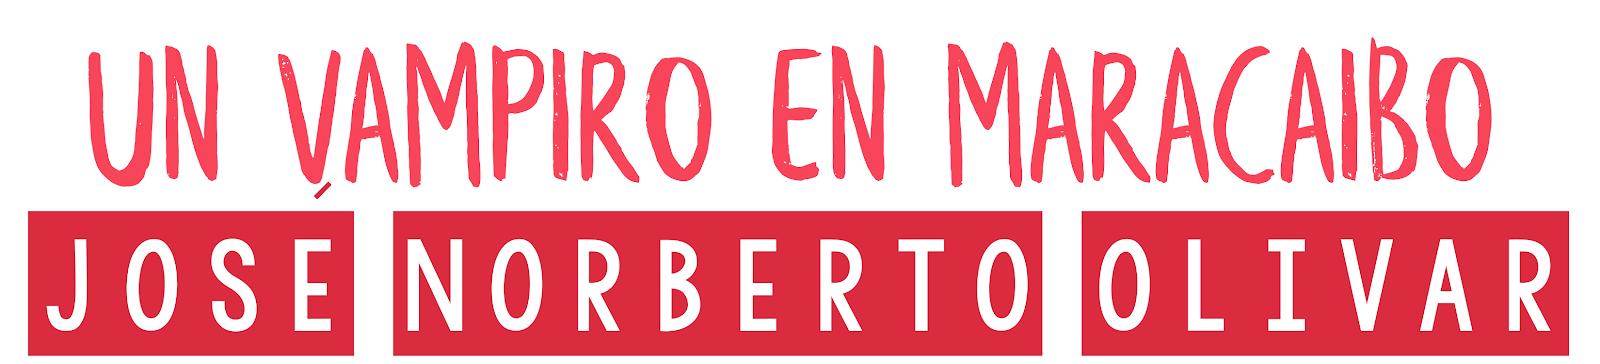 Un vampiro en Maracaibo, Norberto José Olivar.